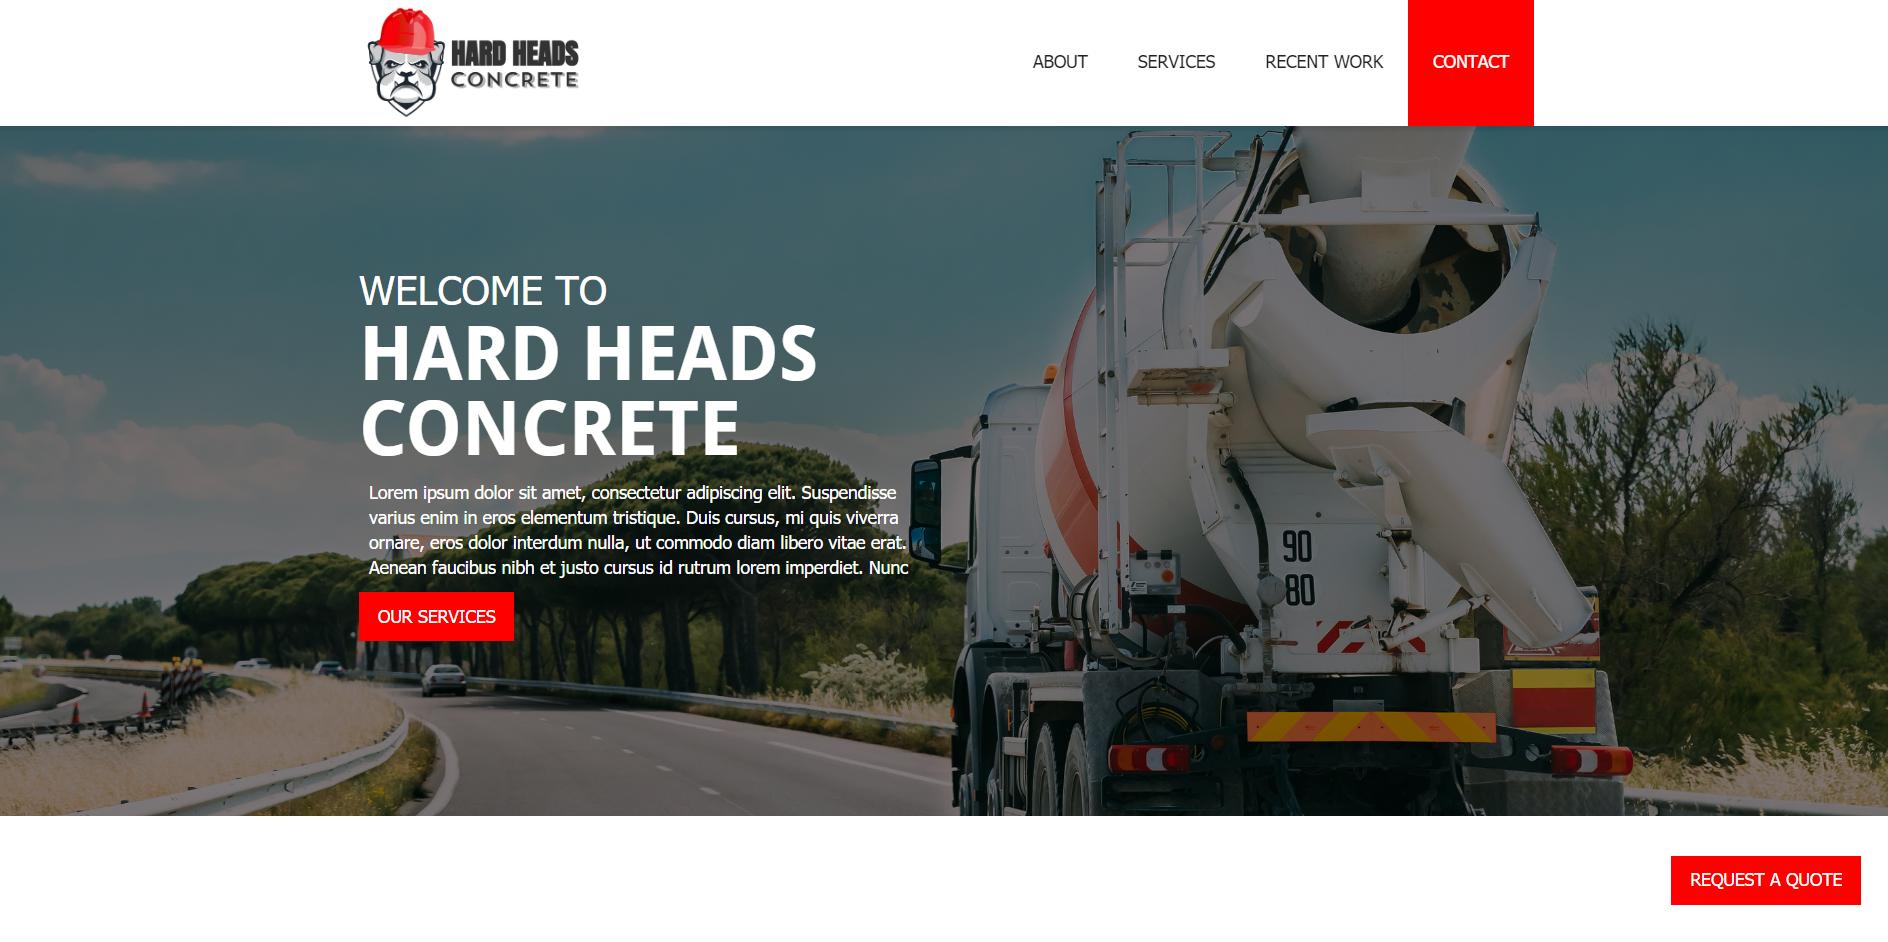 hard heads concrete example